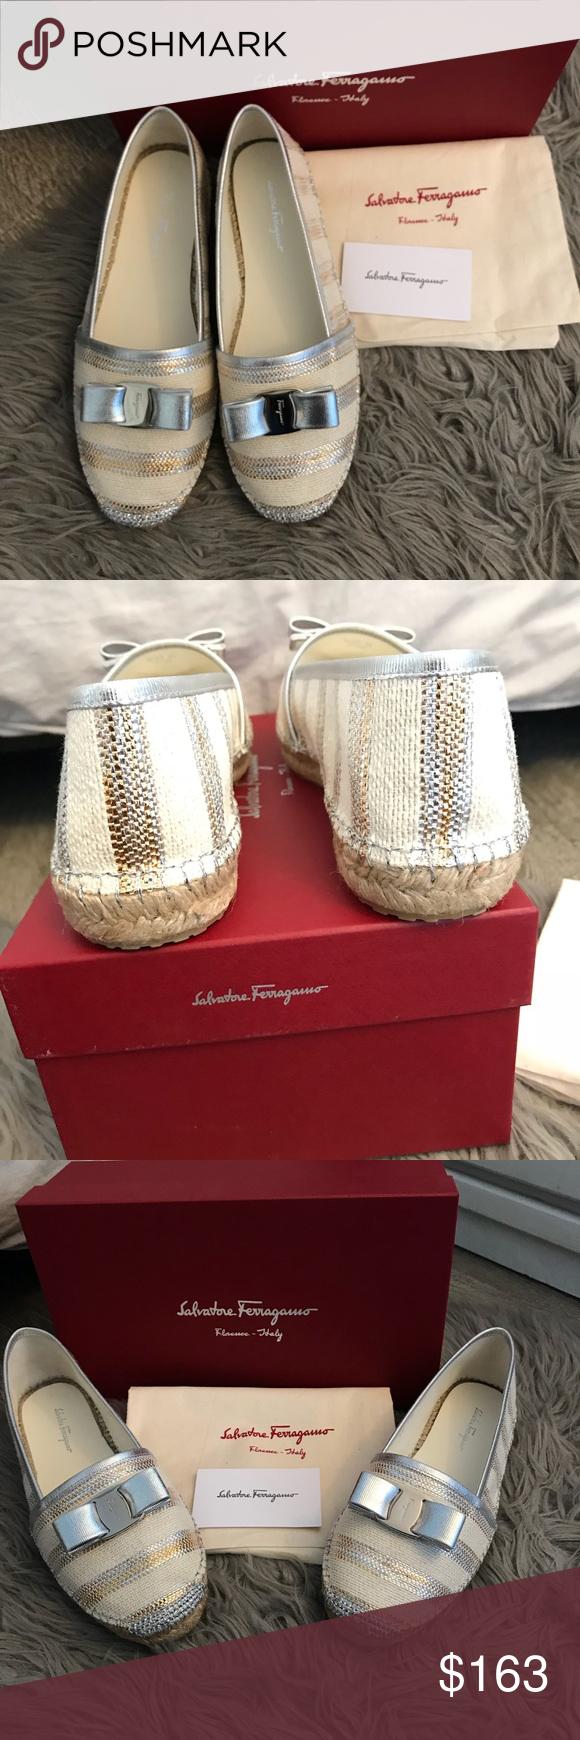 f4a96cef7 Salvatore ferragamo shoes flat Elodie Slip On 9.5 New w/ box Salvatore  ferragamo shoes Elodie espadrilles white silver gold Slip On 9.5 M 100%  authentic ...